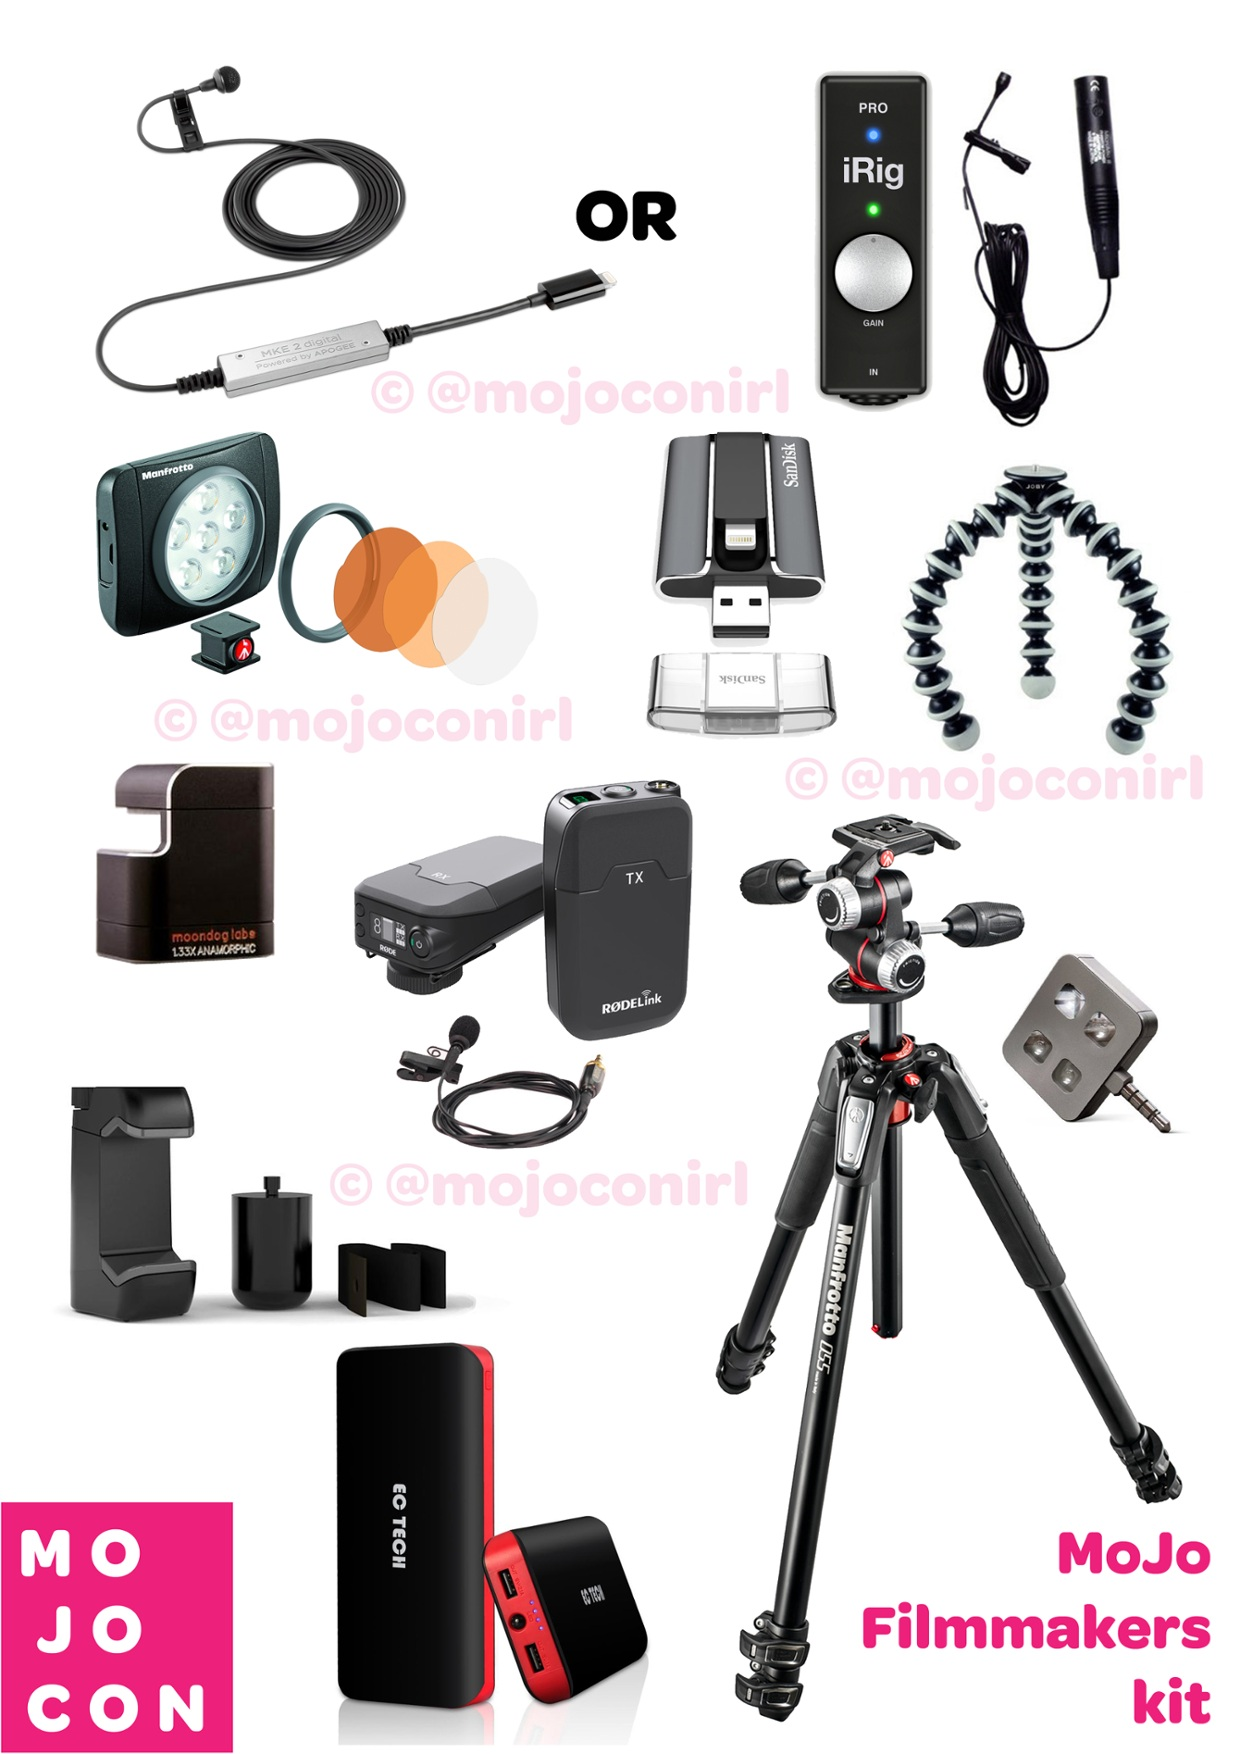 Mojo Interactive Film Makers Kit